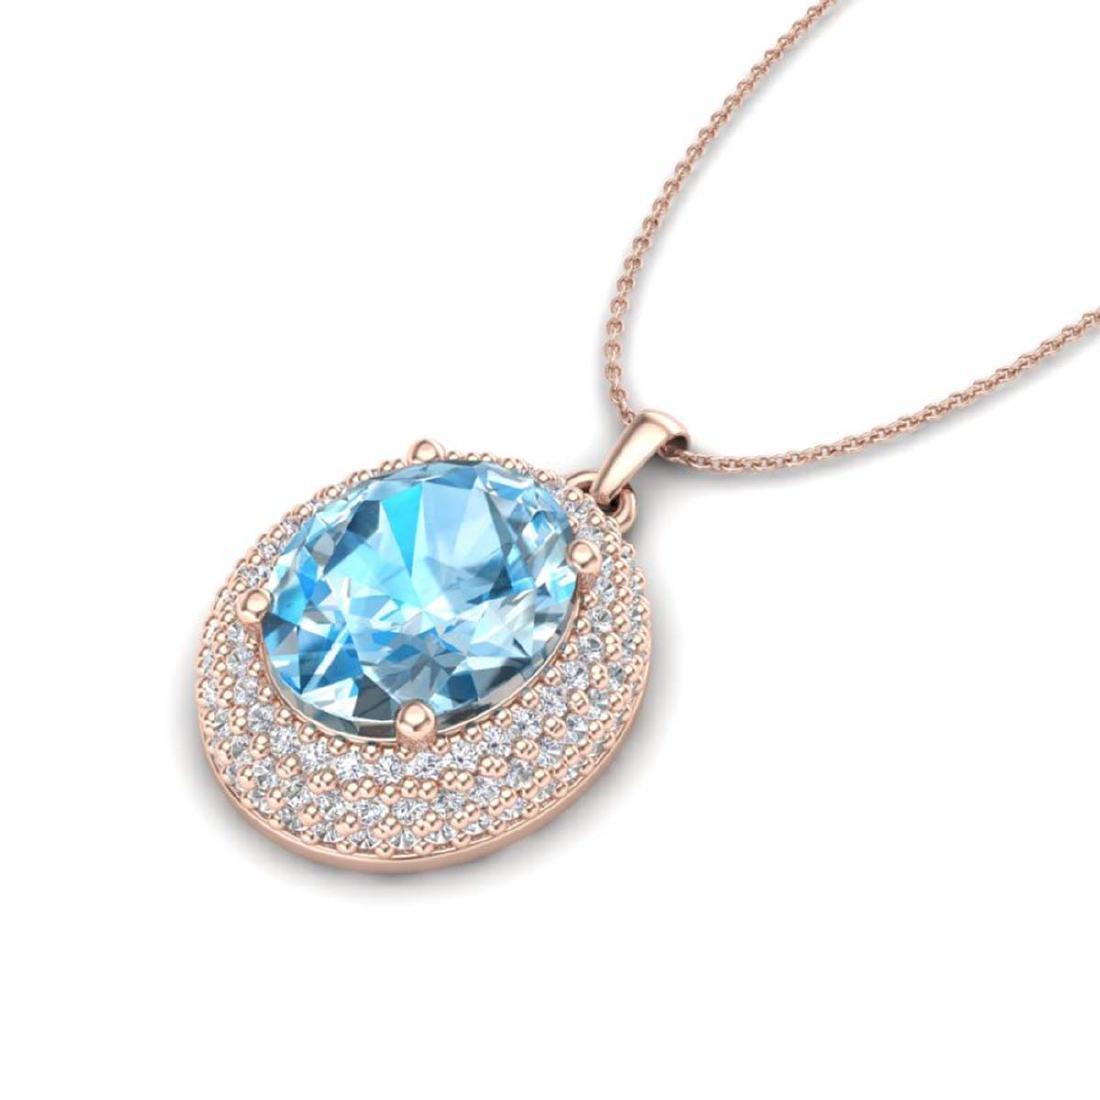 5 CTW Sky Blue Topaz & VS/SI Diamond Necklace 14K Gold - 2